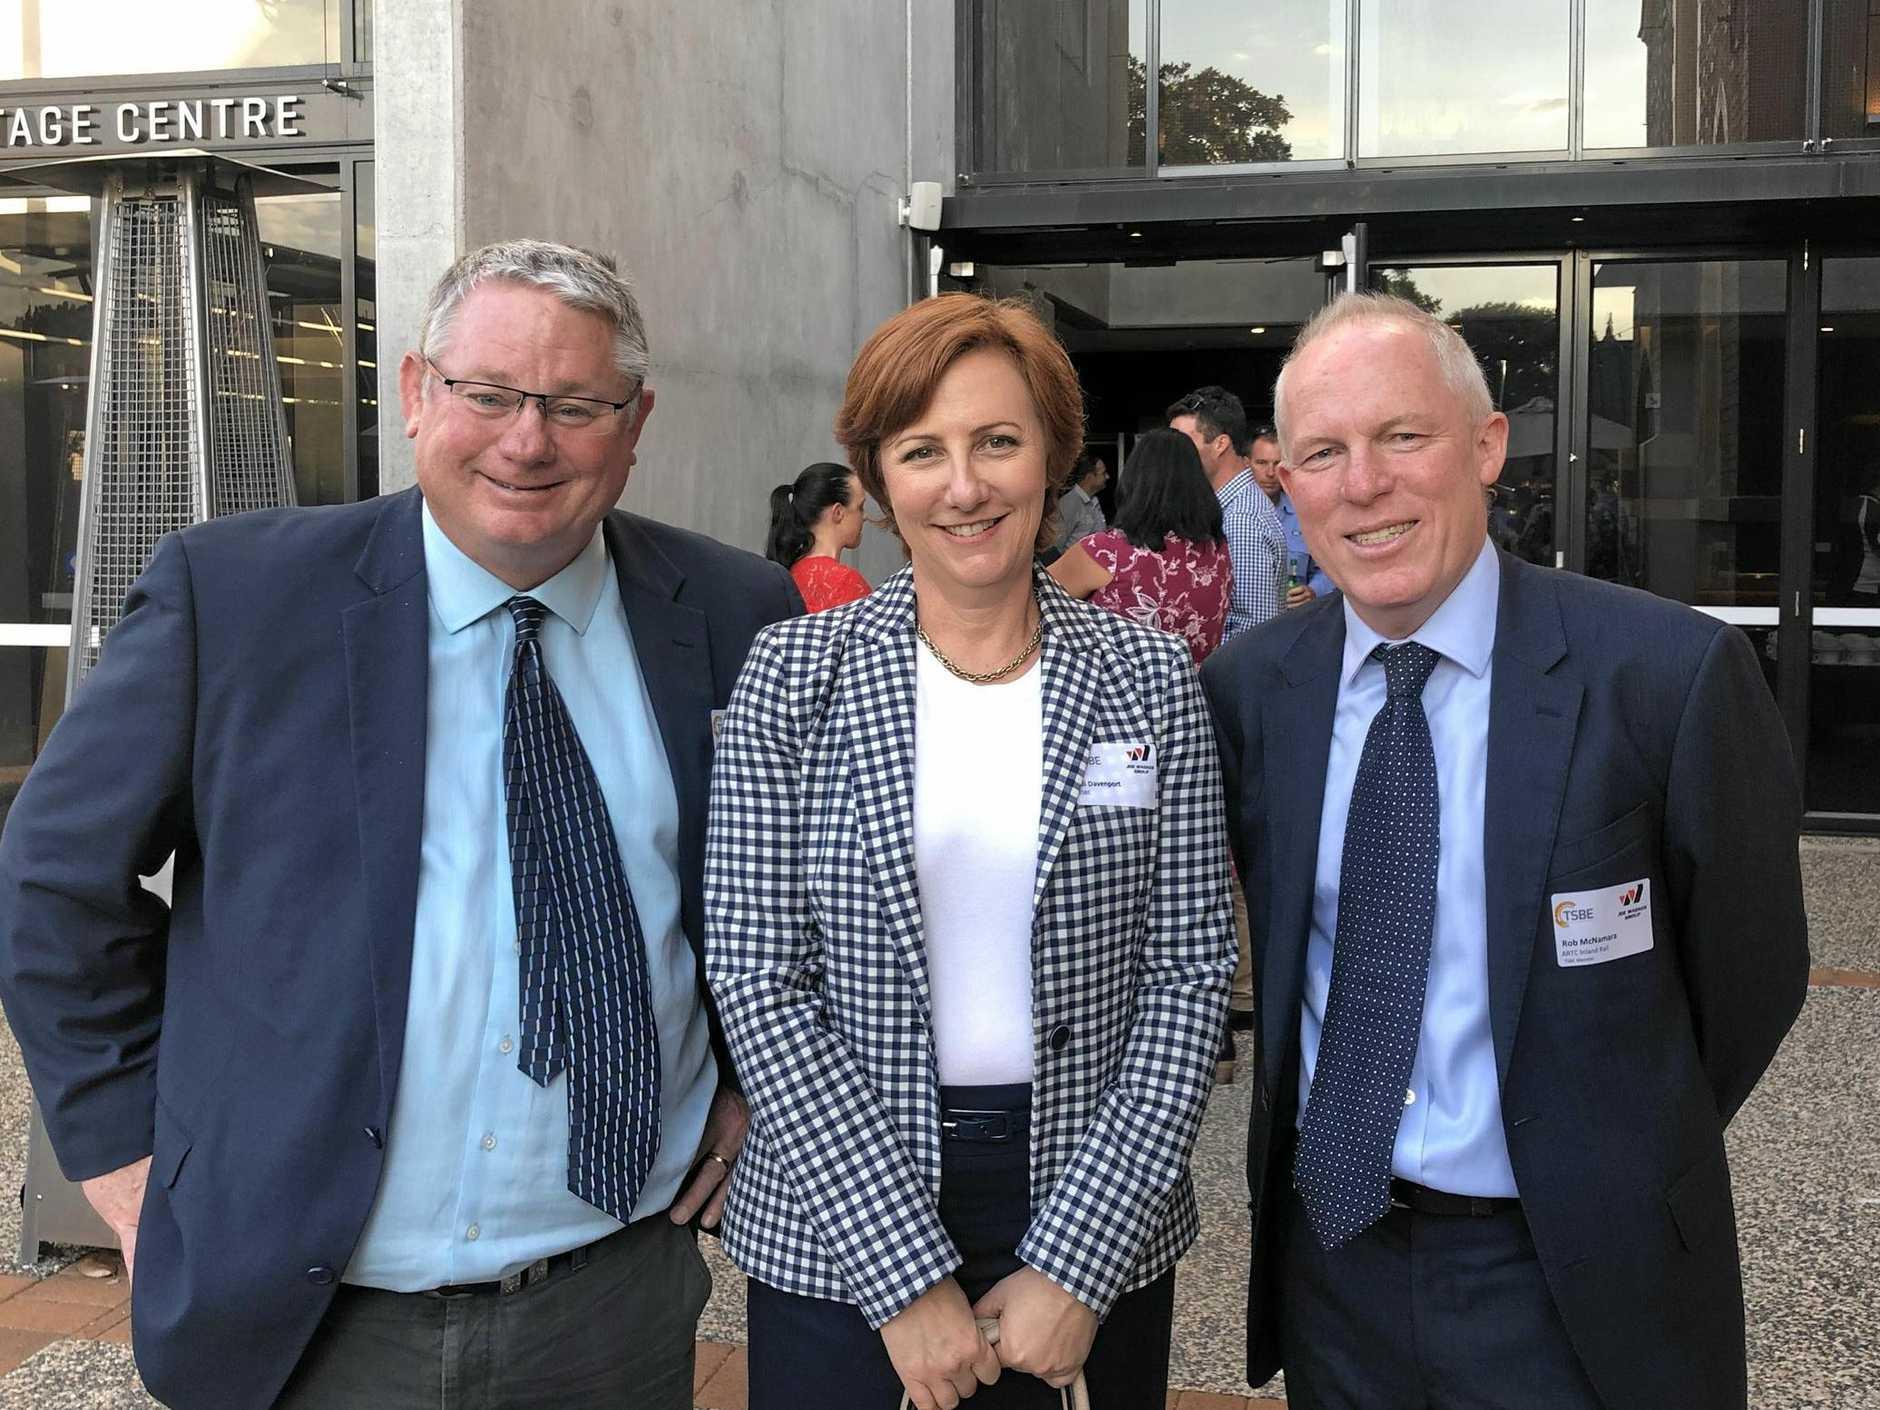 BIG BUILD: TSBE CEO Ali Davenport and Australian Rail Track Corporation North Star to Gowrie project director Rob McNamara.